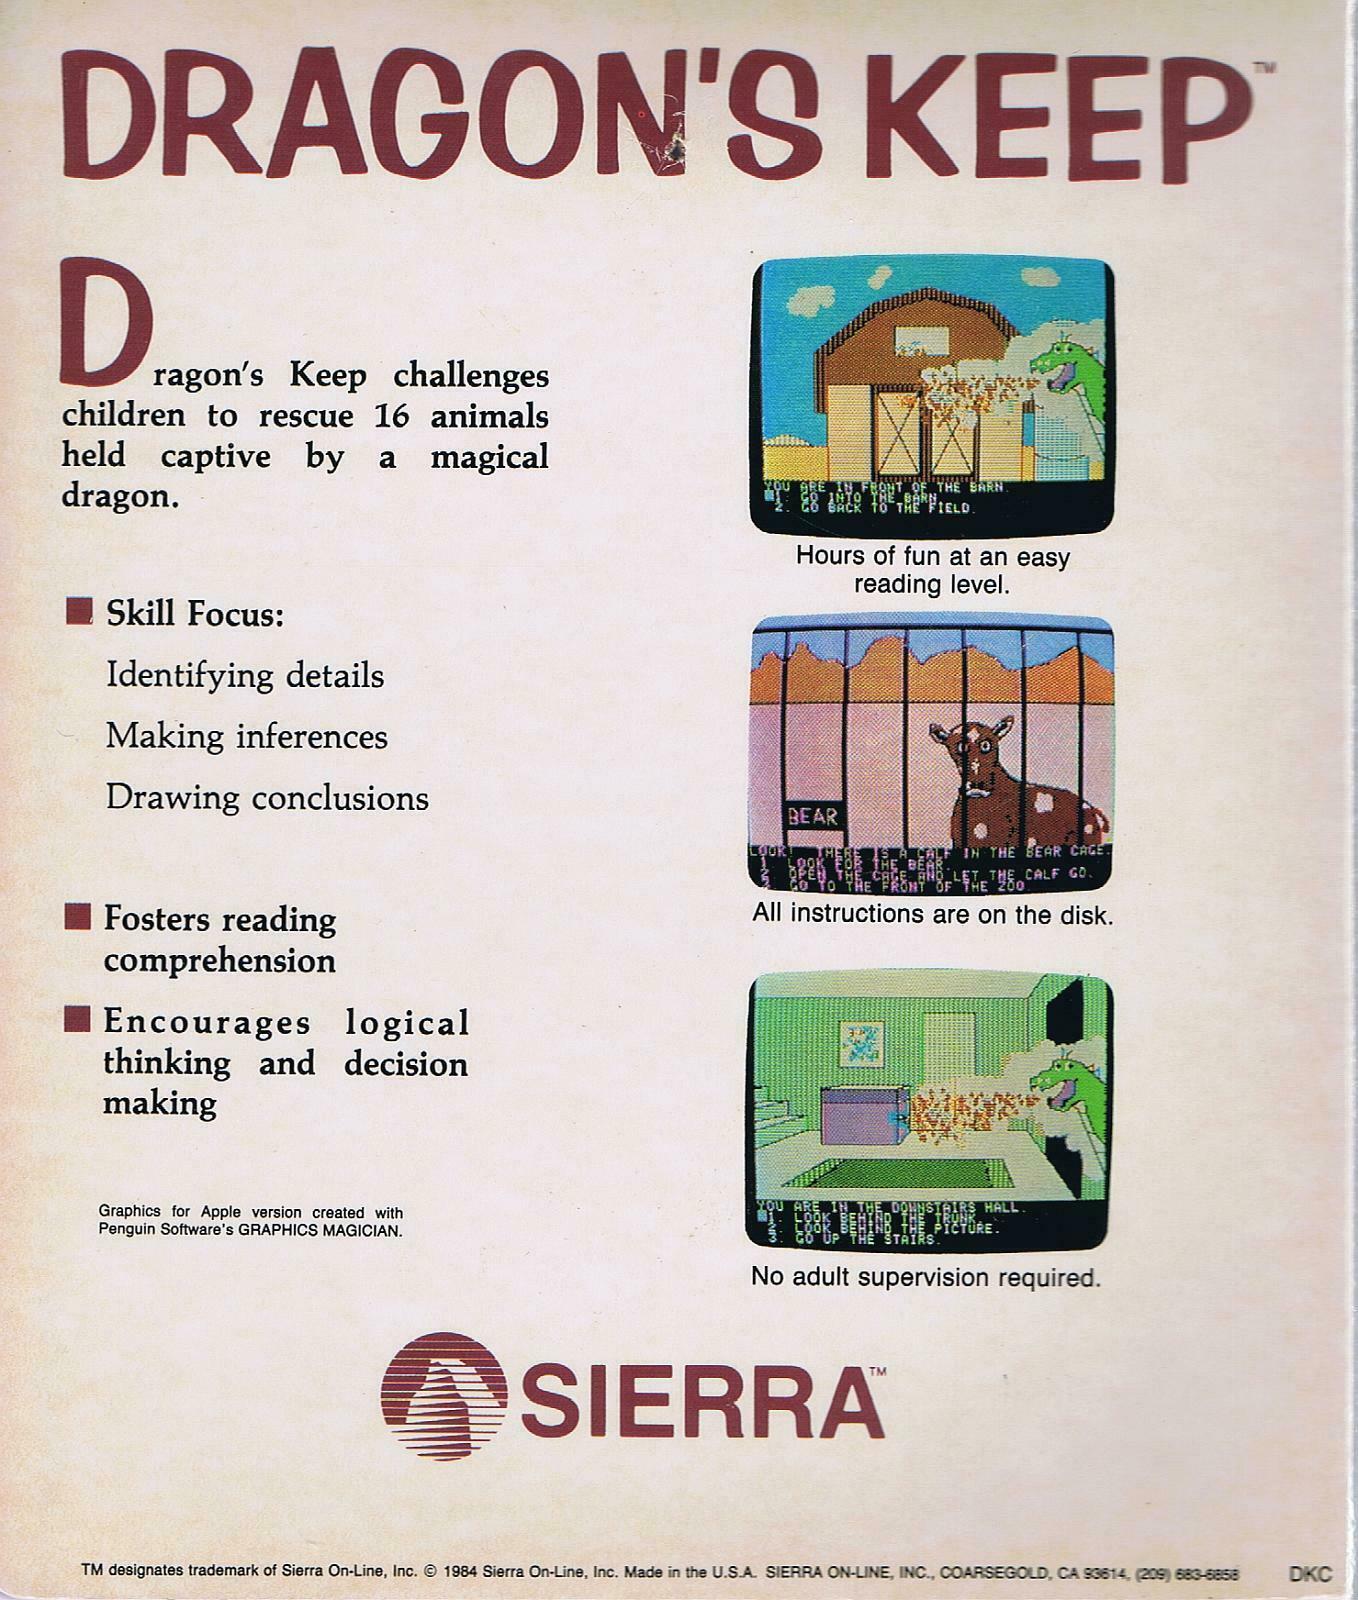 c64-dragon's-keep-sierra-03